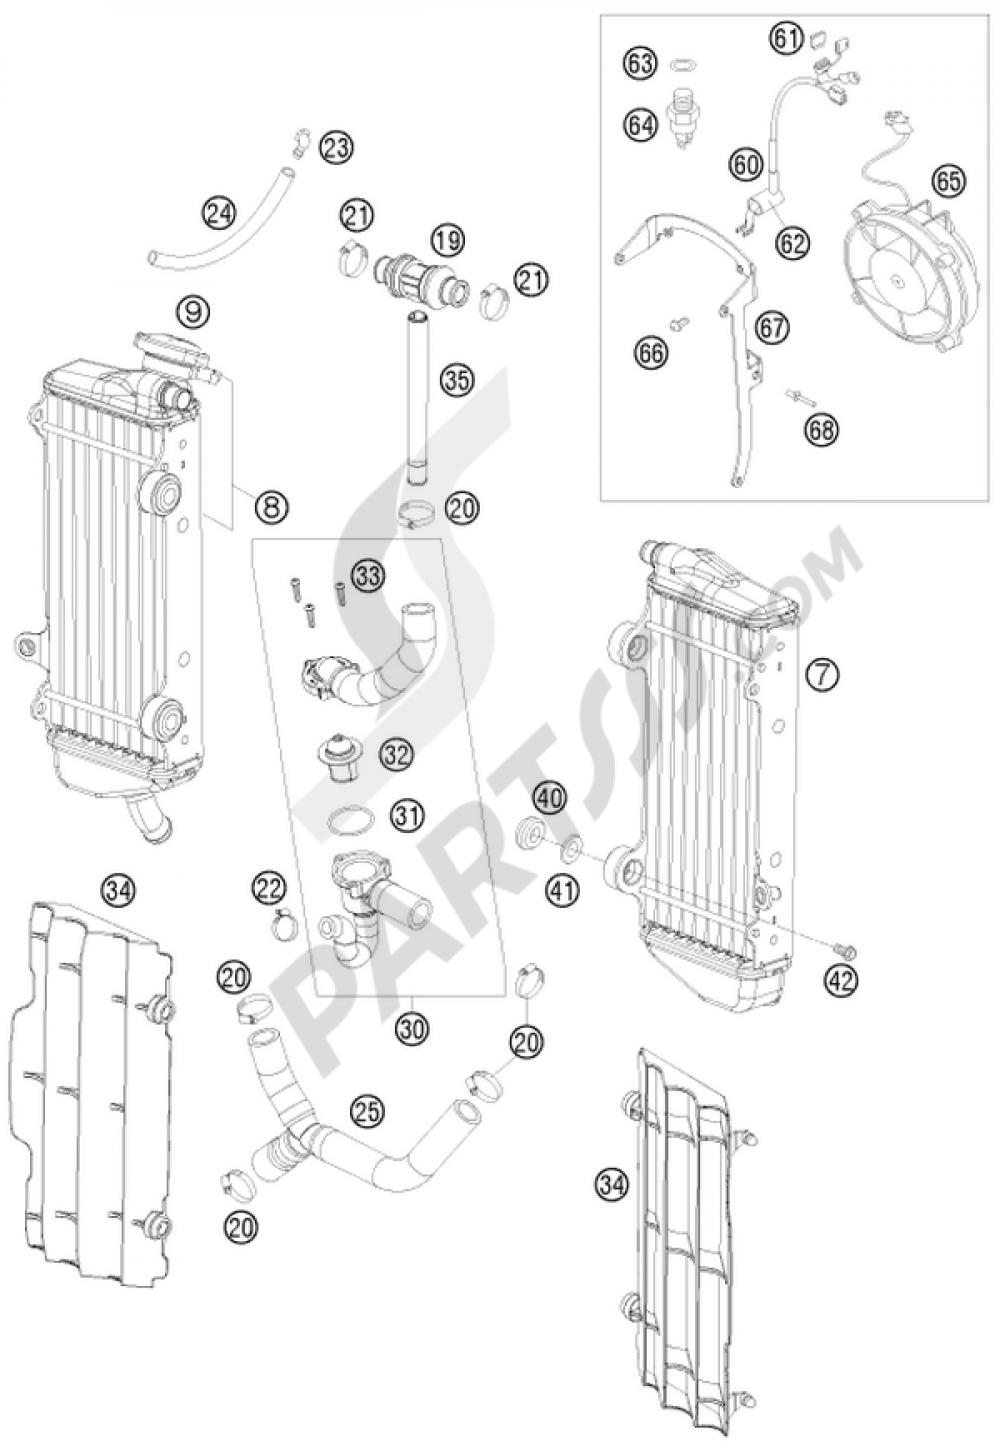 Cooling System Ktm 450 Exc R Six Days 2008 Eu Engine Diagram